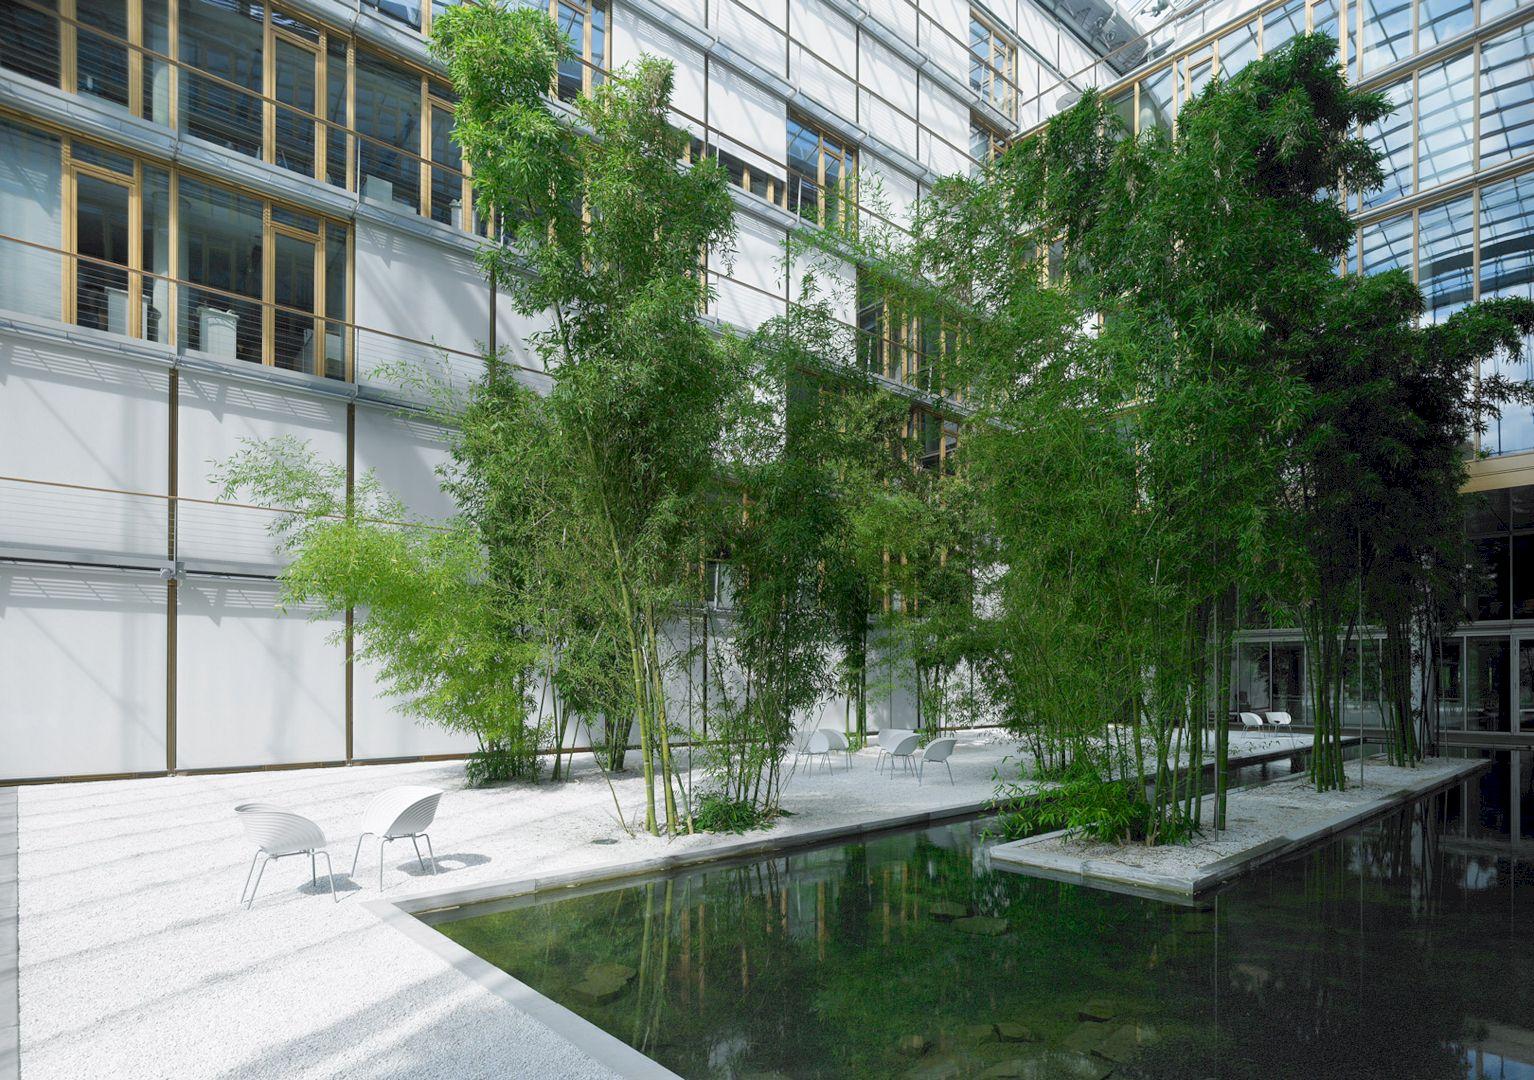 Lufthansa Aviation Center Frankfurt By Ingenhoven Architects 6